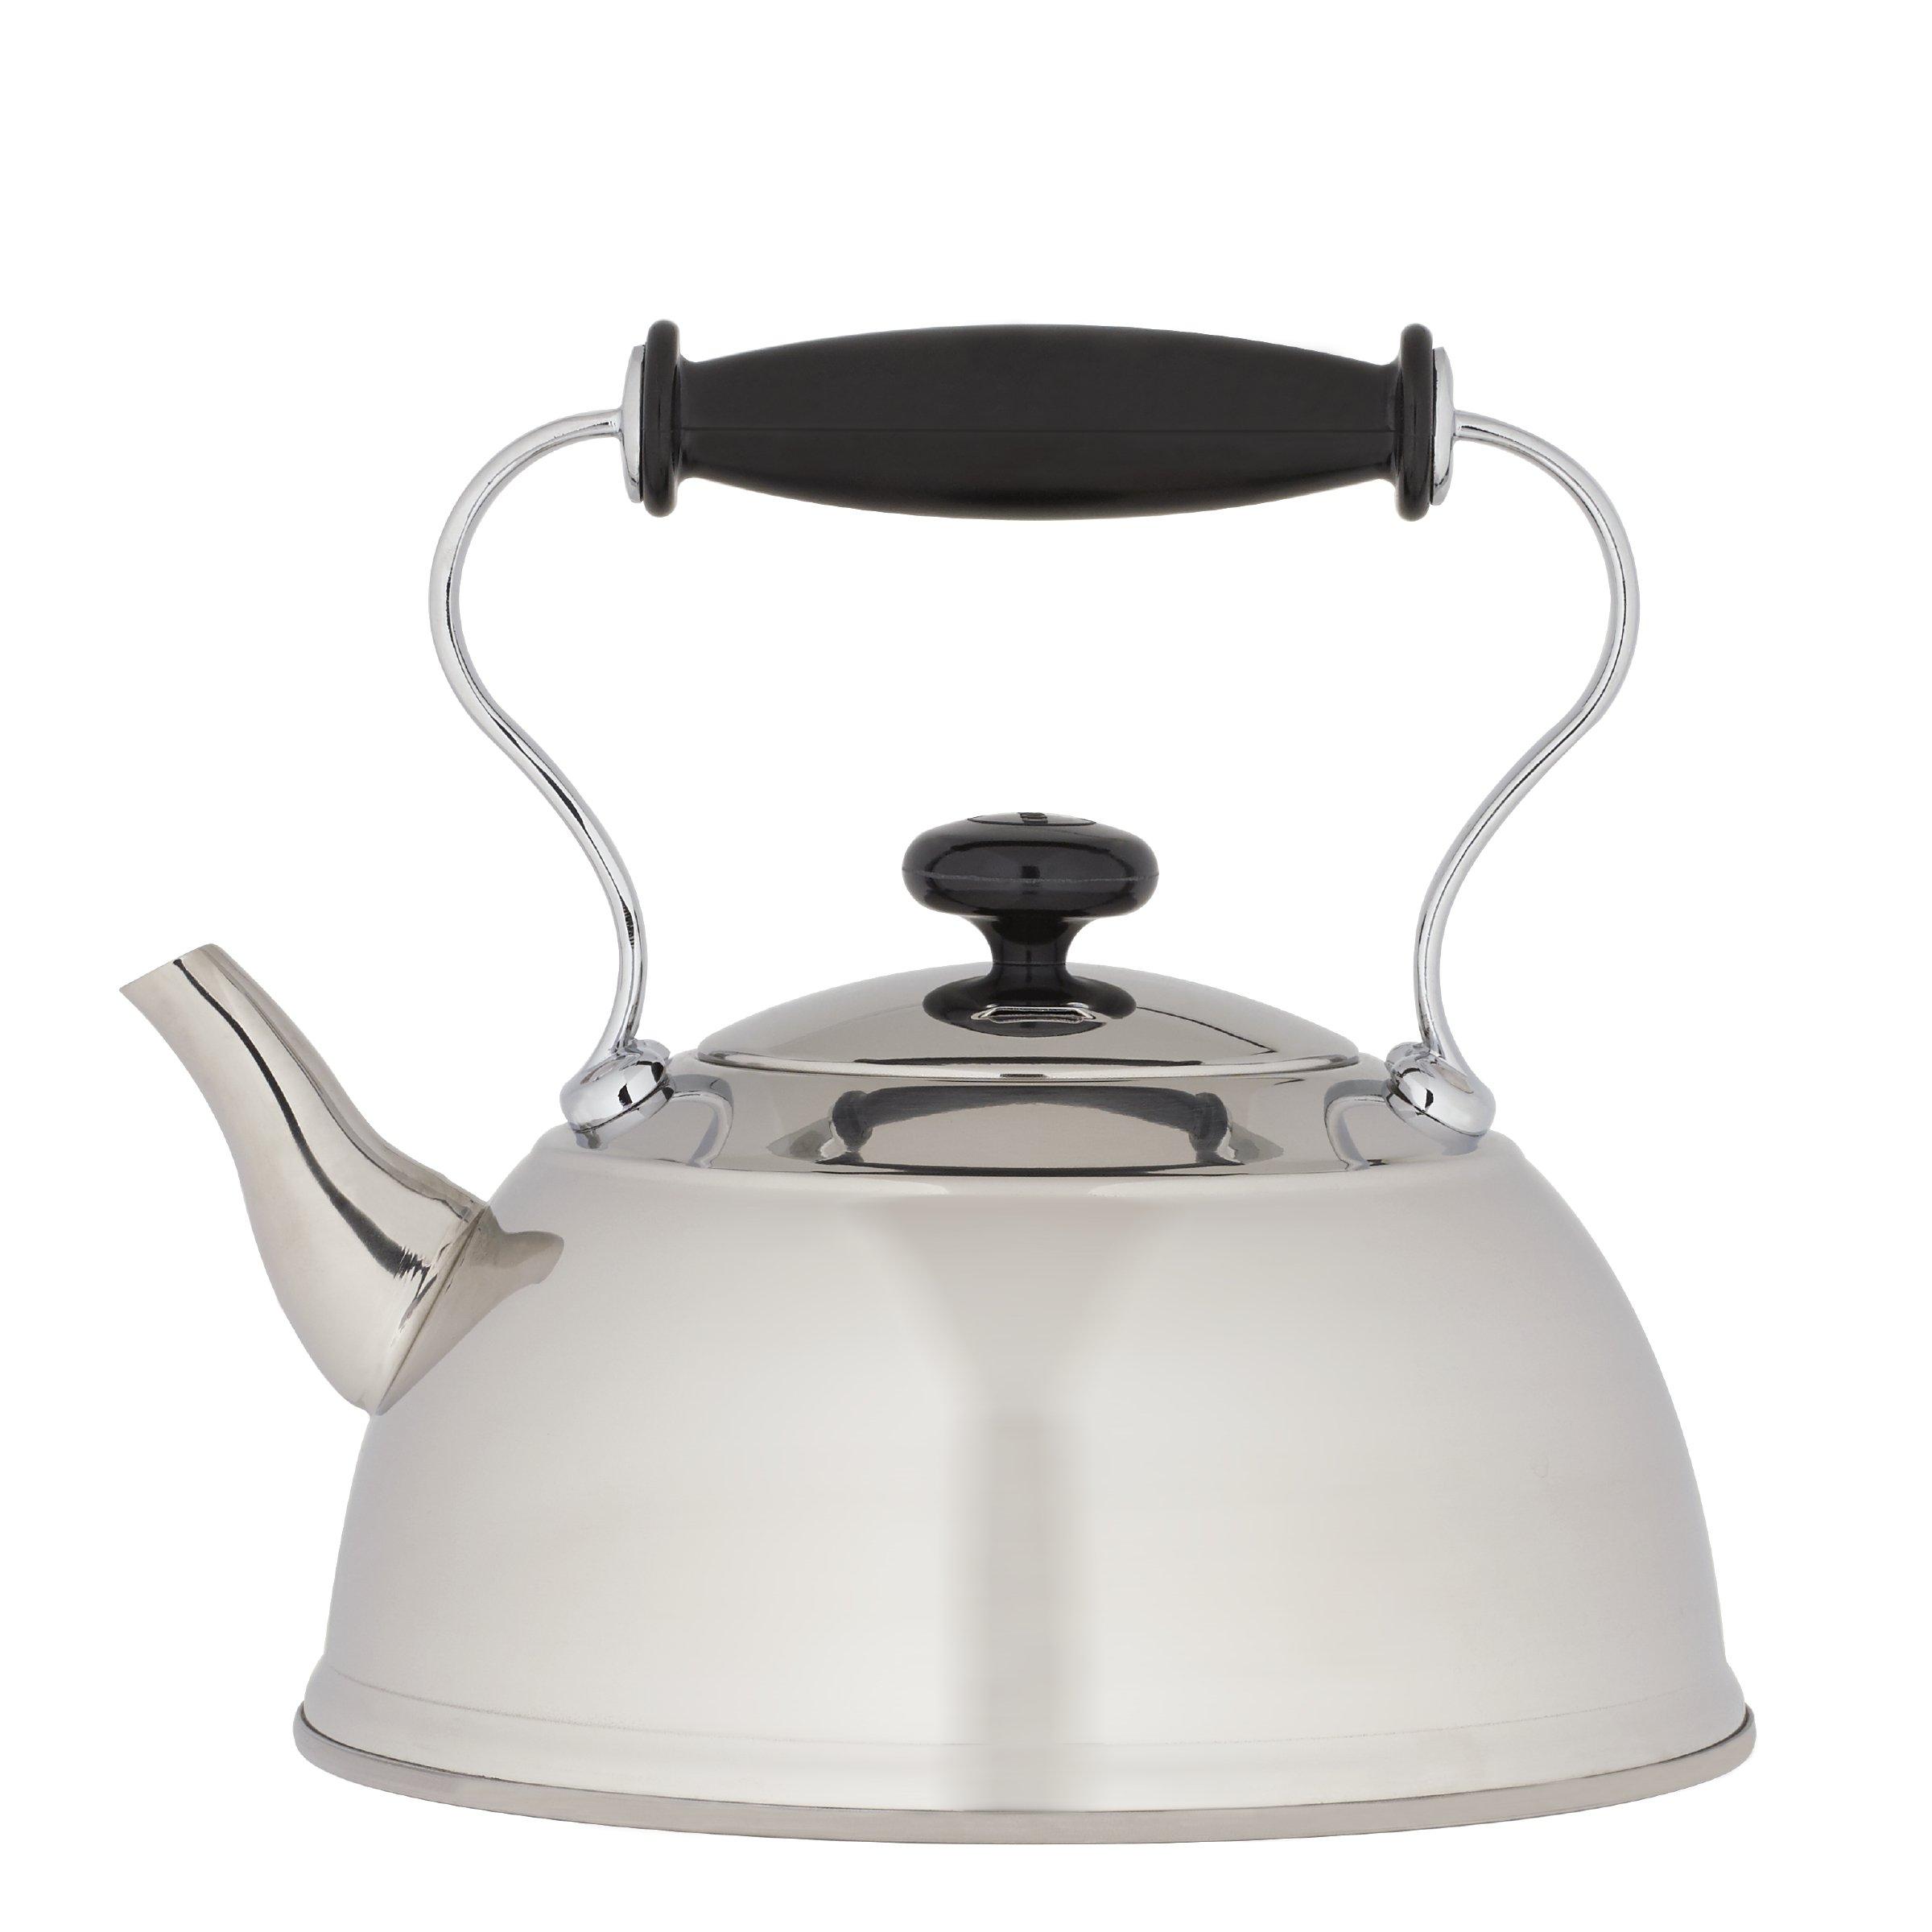 Copco 2501-9705 Cambridge Polished Stainless Steel Tea Kettle, 1.5-Quart